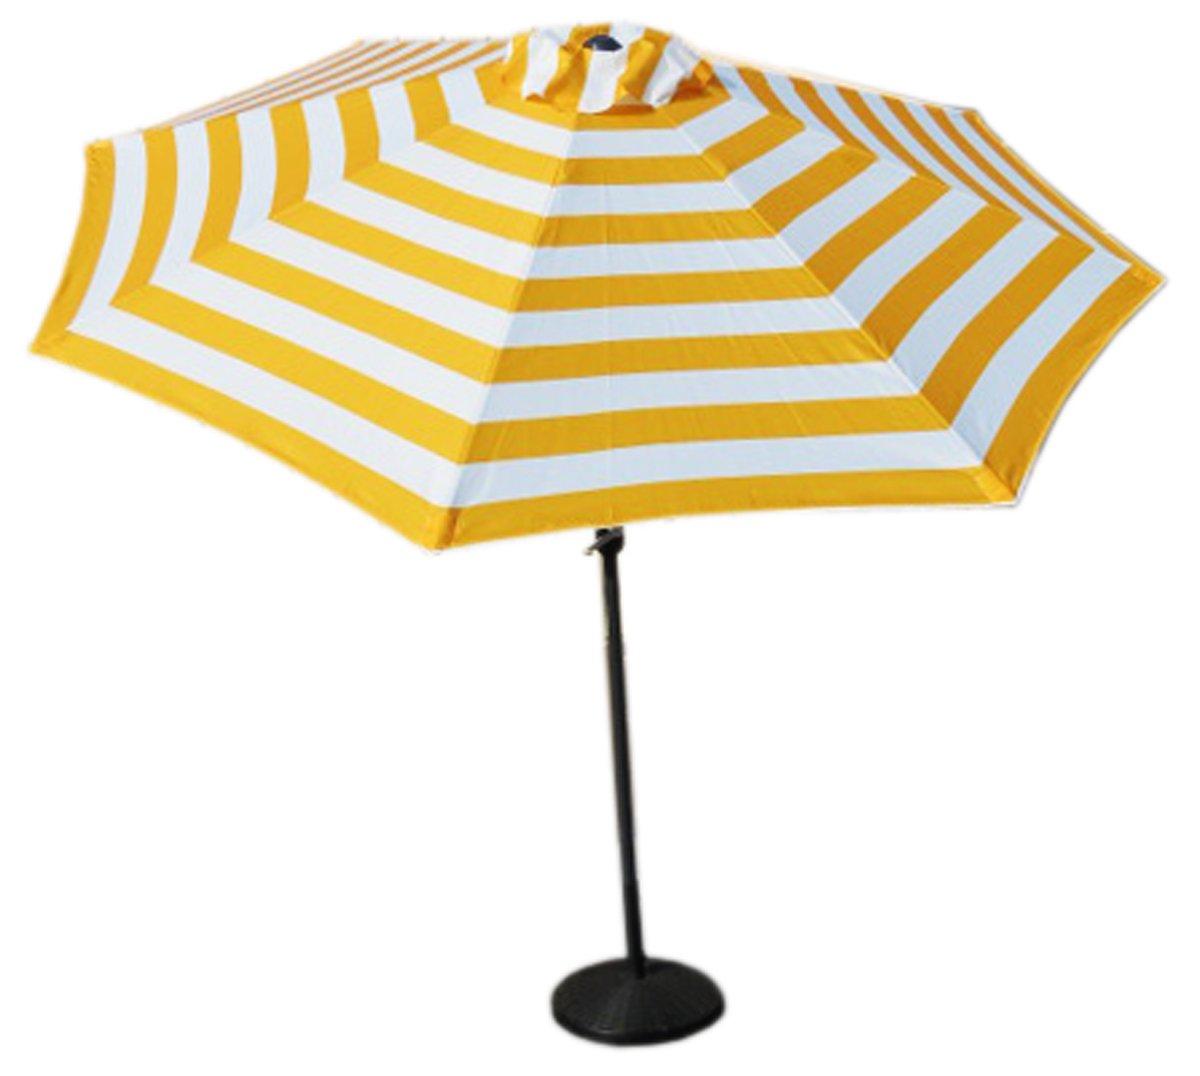 187600724 Amazon.com : VMI M-03581 Striped Umbrella, Large, Yellow : Garden & Outdoor